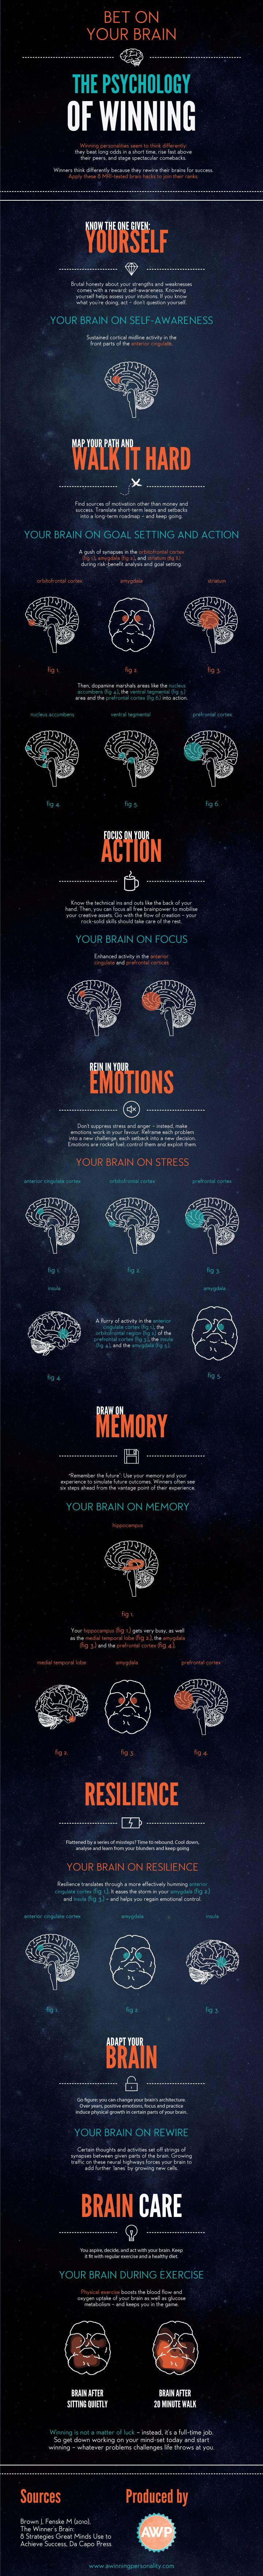 eb7d521efceb7befa9d99ade5ec0ba1b--healthy-brain-brain-health Psychology Infographic : Bet-on-your-Brain-The-Psychology-of-Winning Apuesta por tu cerebro. La psicolog...